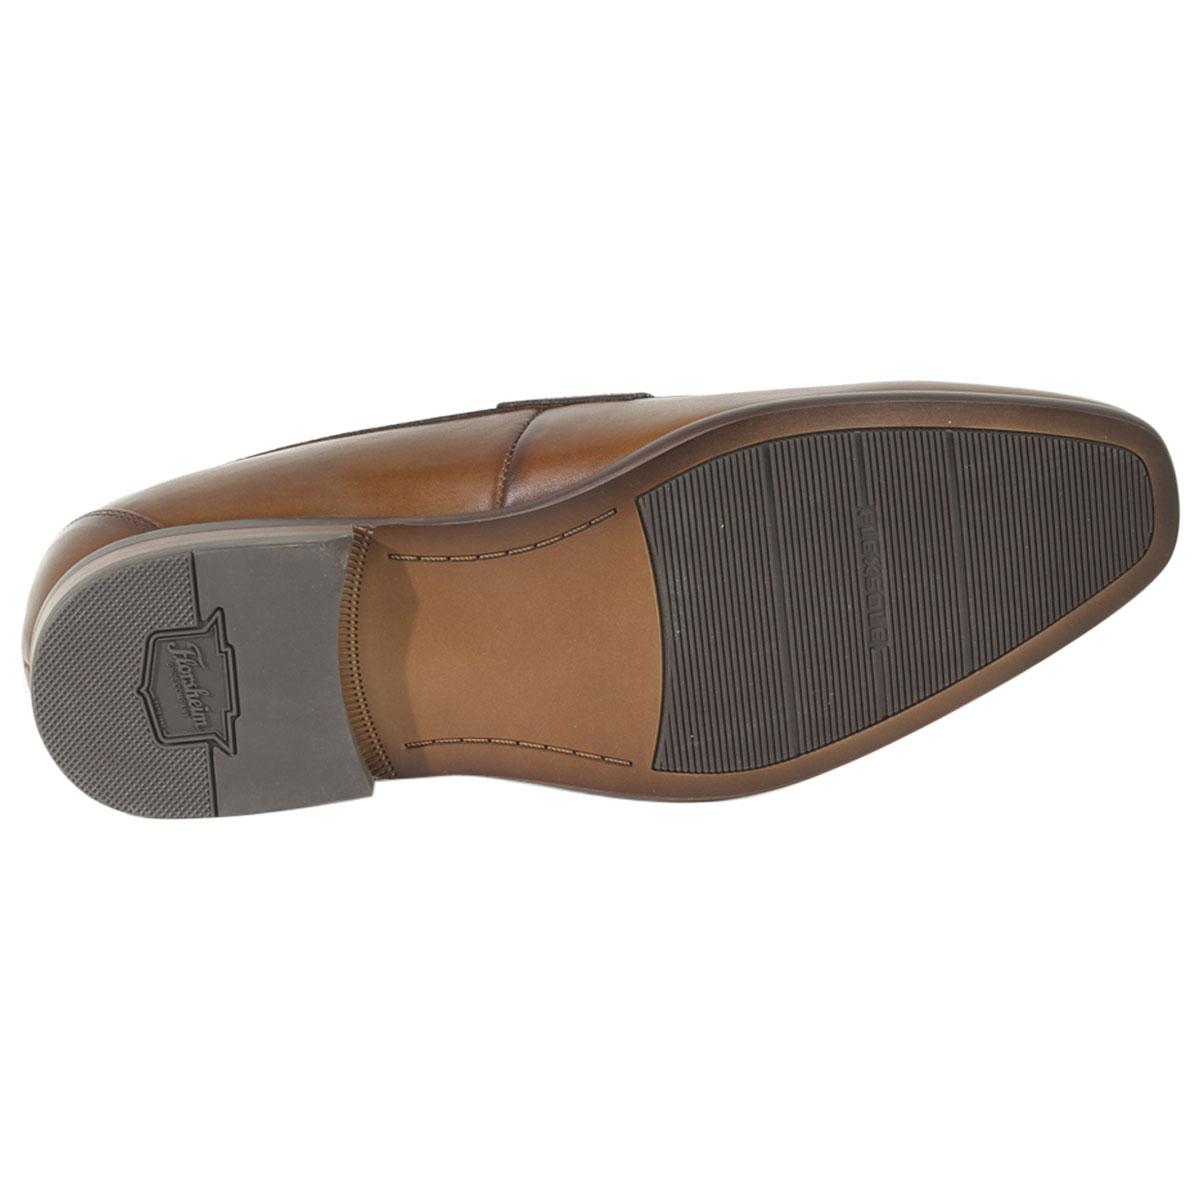 Florsheim-Men-039-s-Postino-Penny-Loafers-Shoes thumbnail 20